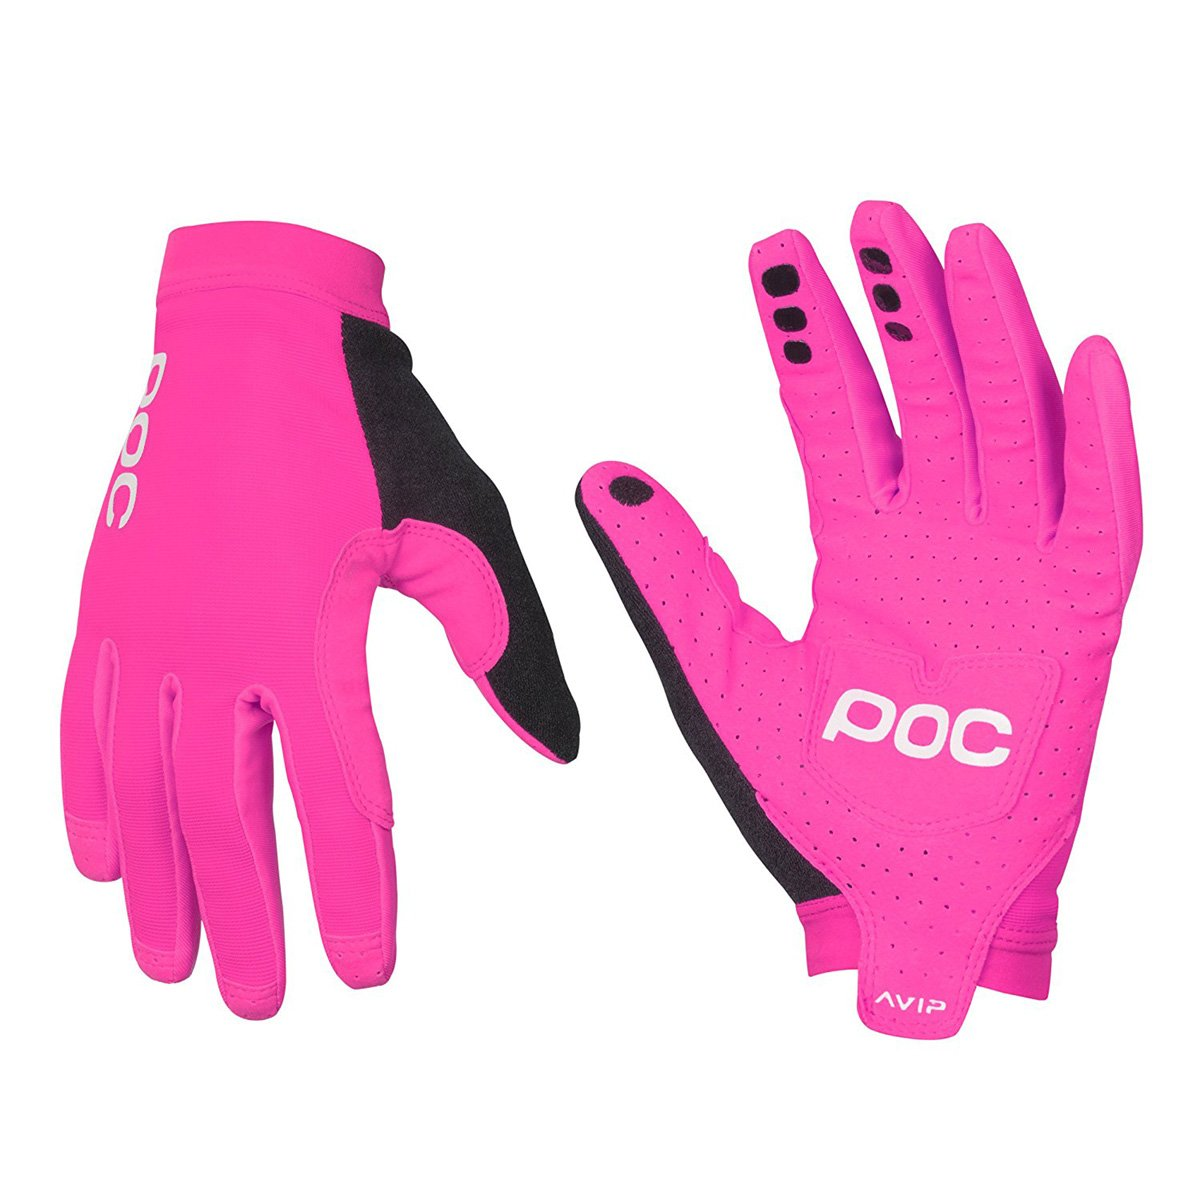 POC Avip Long Women 's Road Cycling Gloves蛍光ピンクLarge B0783ZKJ37